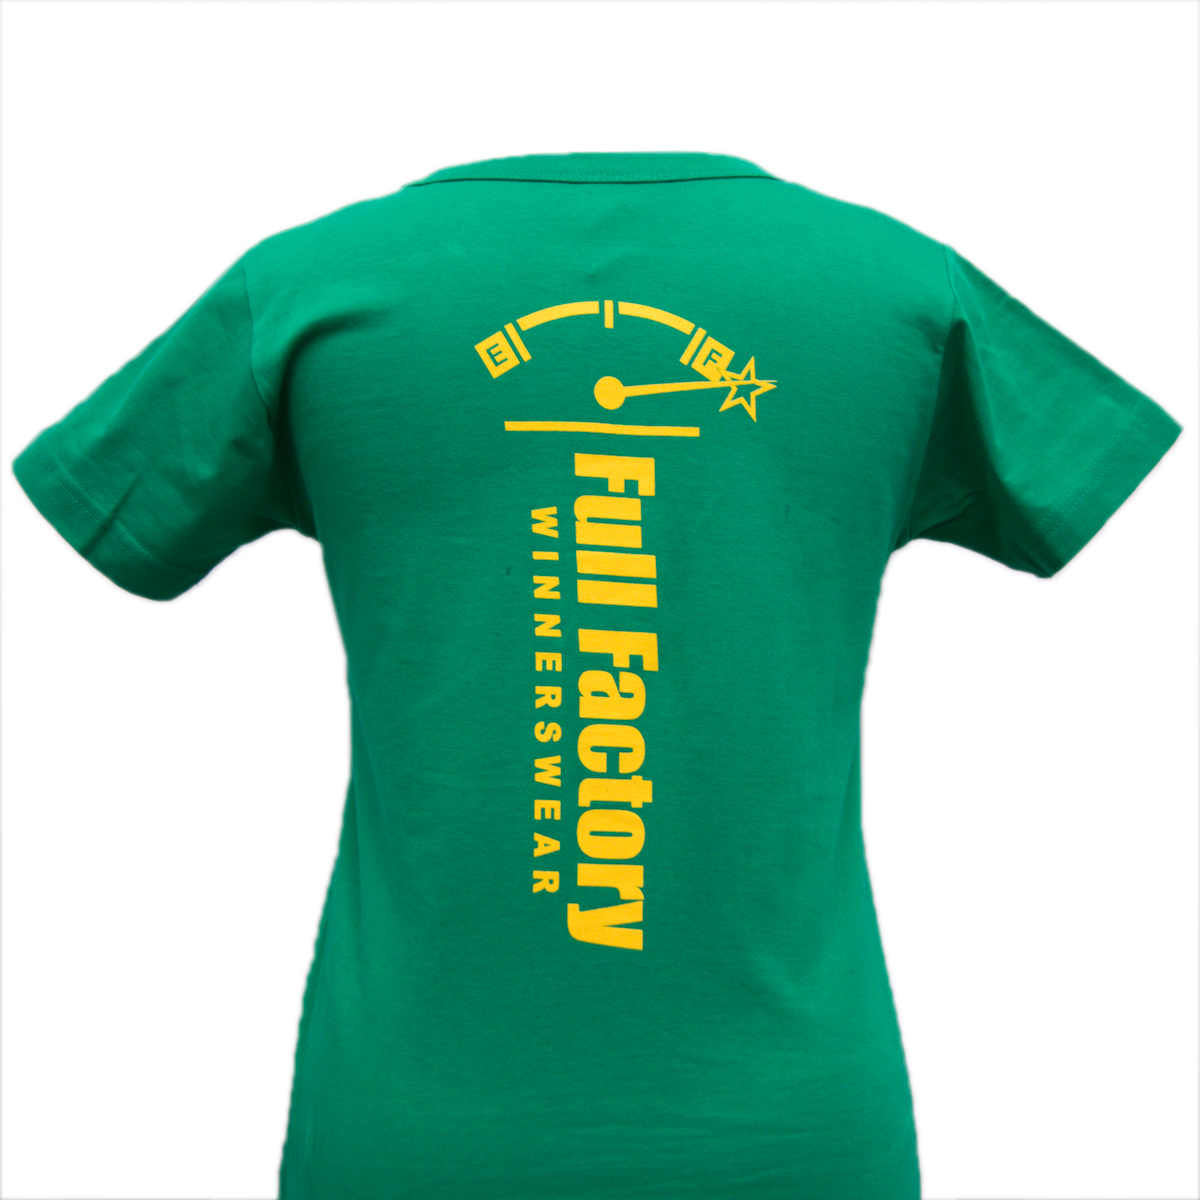 Ladies Full Factory Green & Yellow T-Shirt Image (Back)